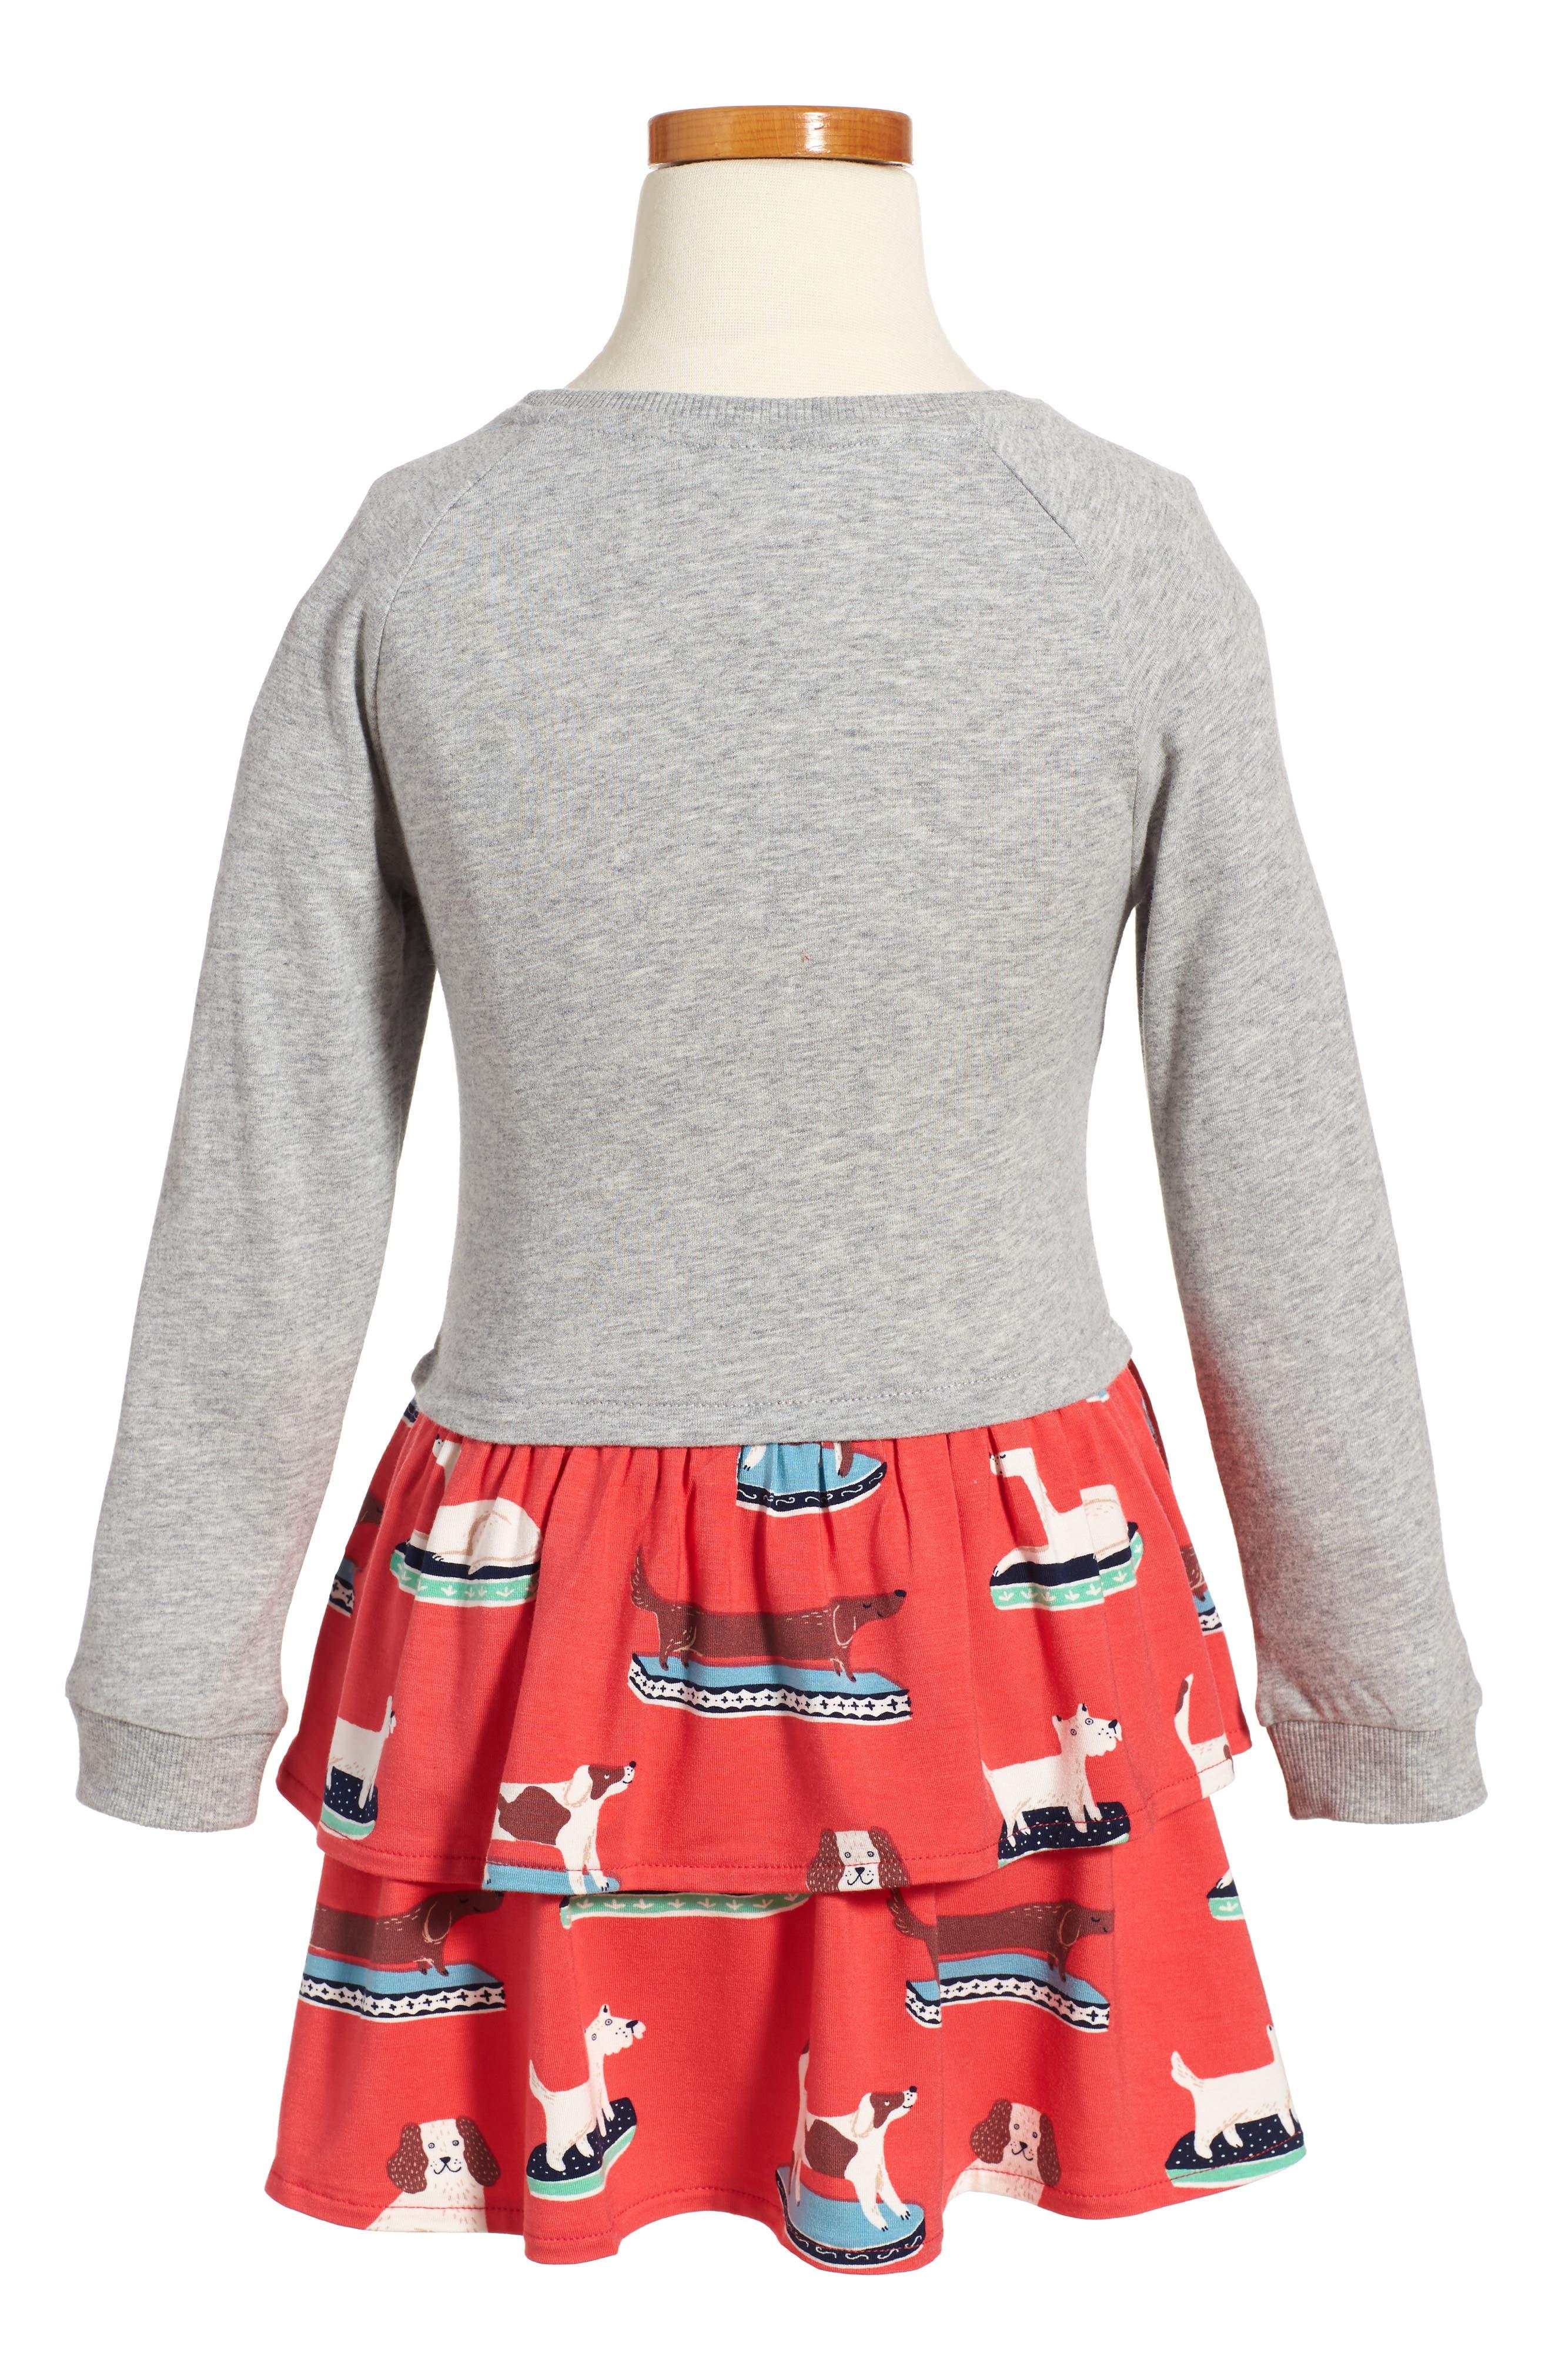 Twirly Sequin Dalmatian Dress,                             Alternate thumbnail 2, color,                             024